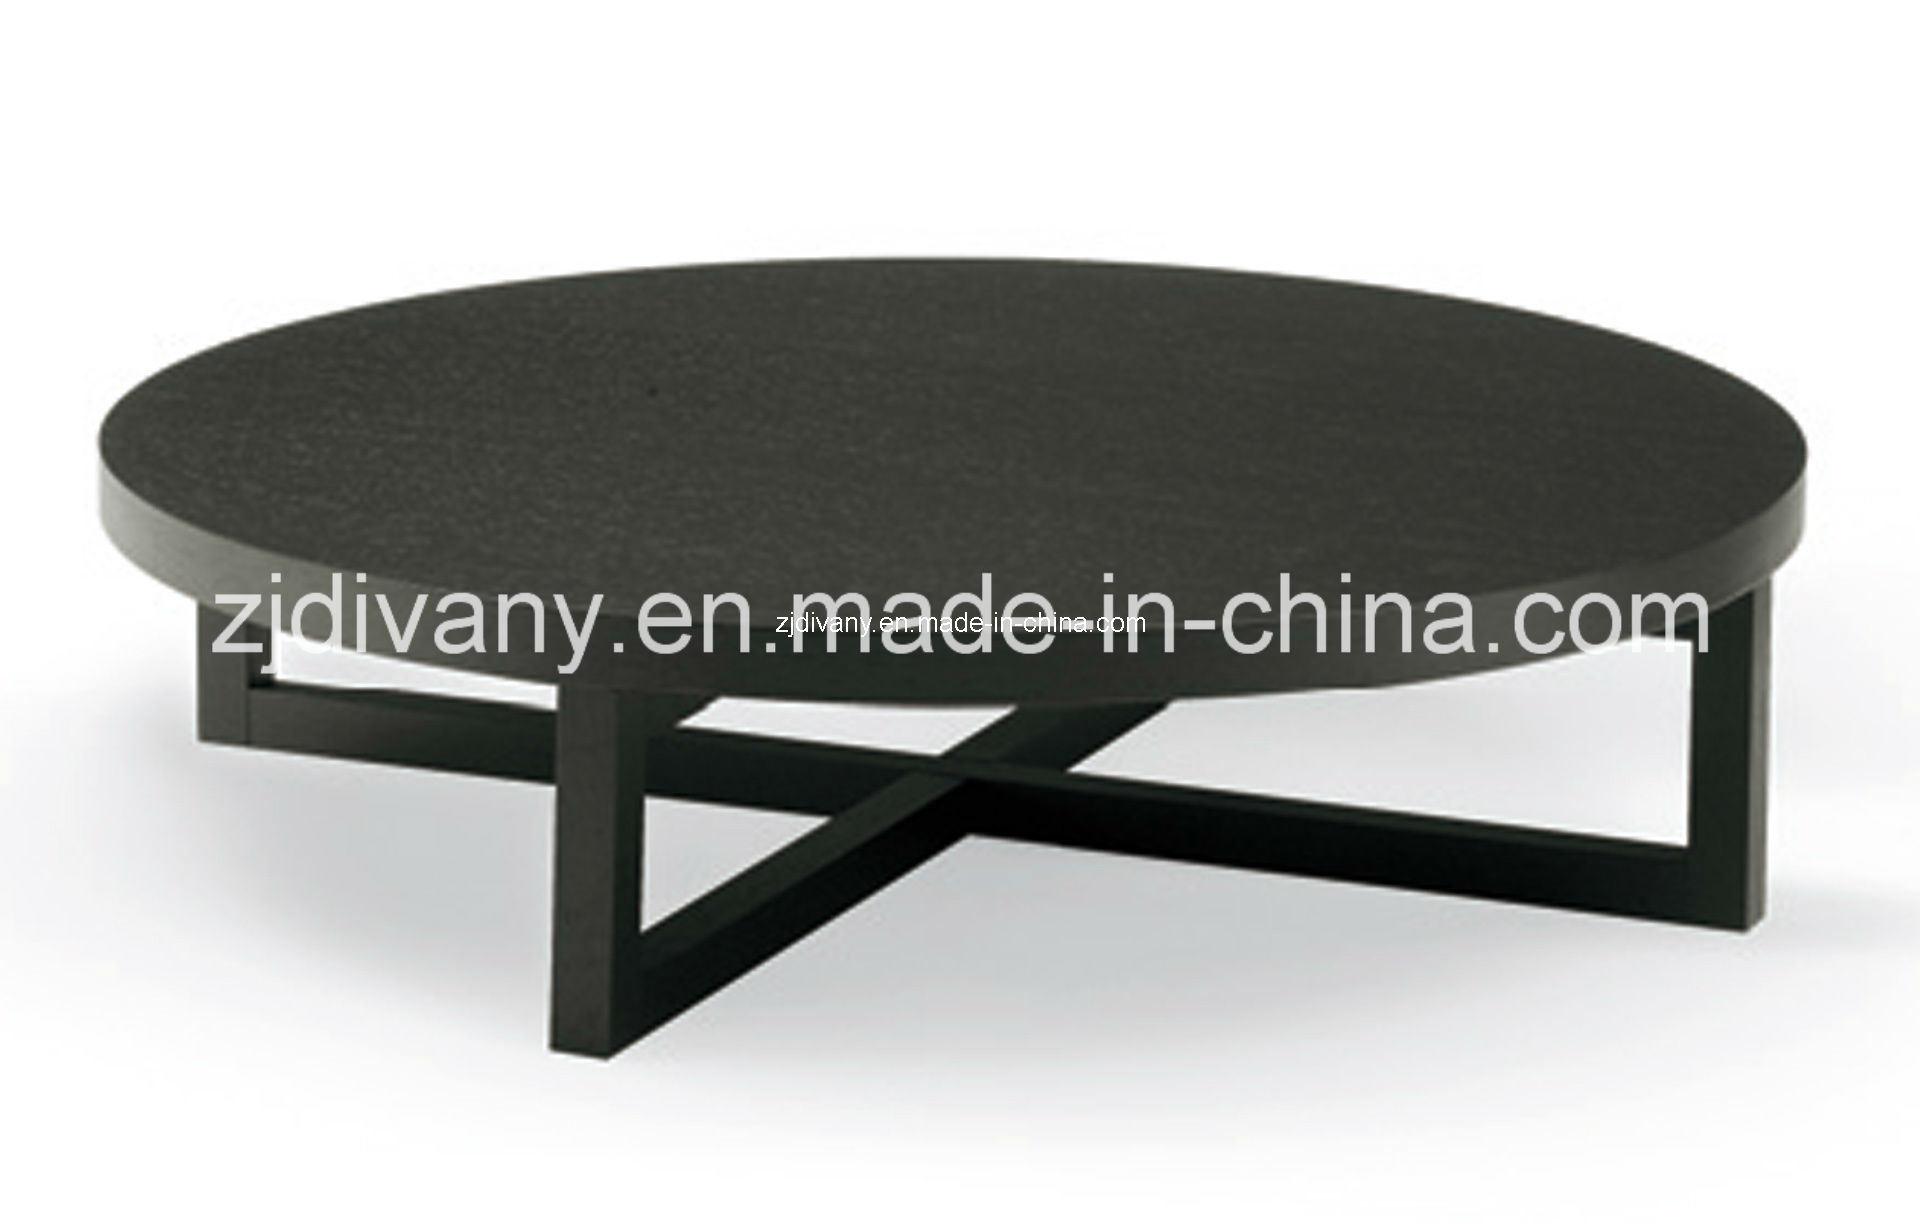 China Ikea Style Modern Wooden Round Coffee Table Ta China